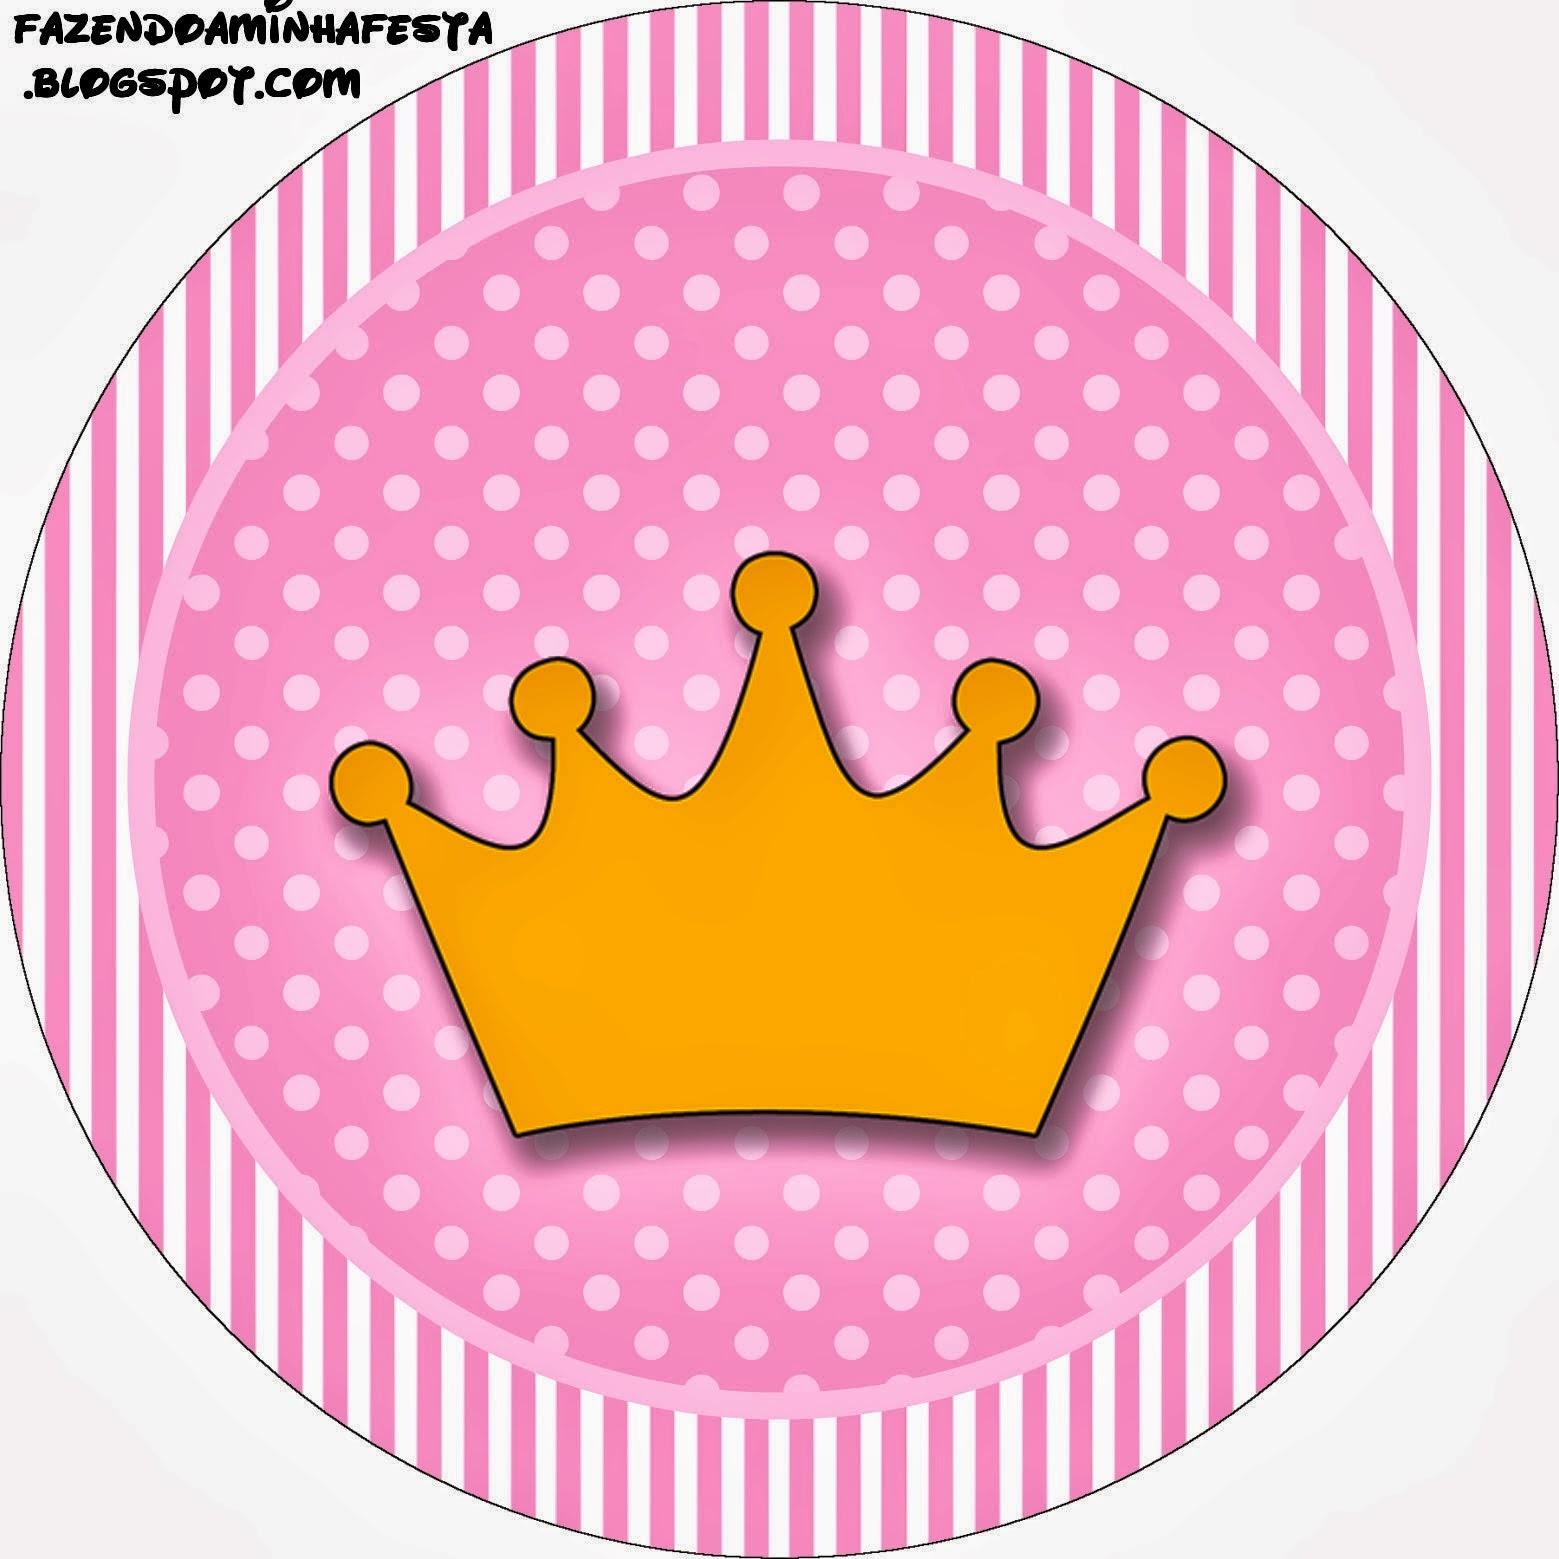 Coronas Para Decorar Cuadernos.Coronas Sobre Fondo Rosa Etiquetas Para Imprimir Gratis